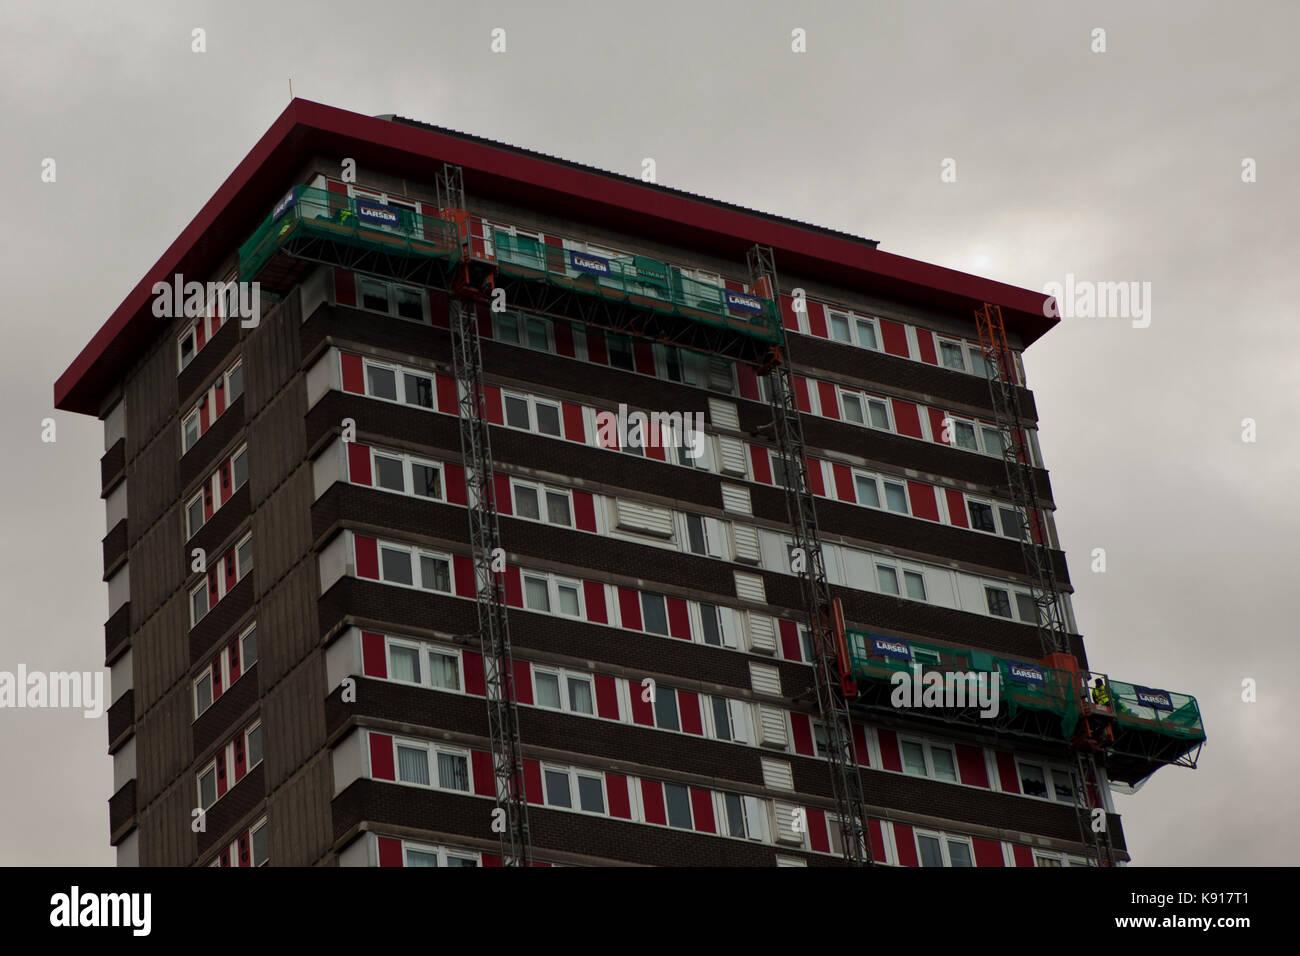 Belfast, UK. 21st Sep, 2017. Belfast, Falls, Road, 21st September 2017. The Northern Ireland Housing Executive (NIHE) - Stock Image